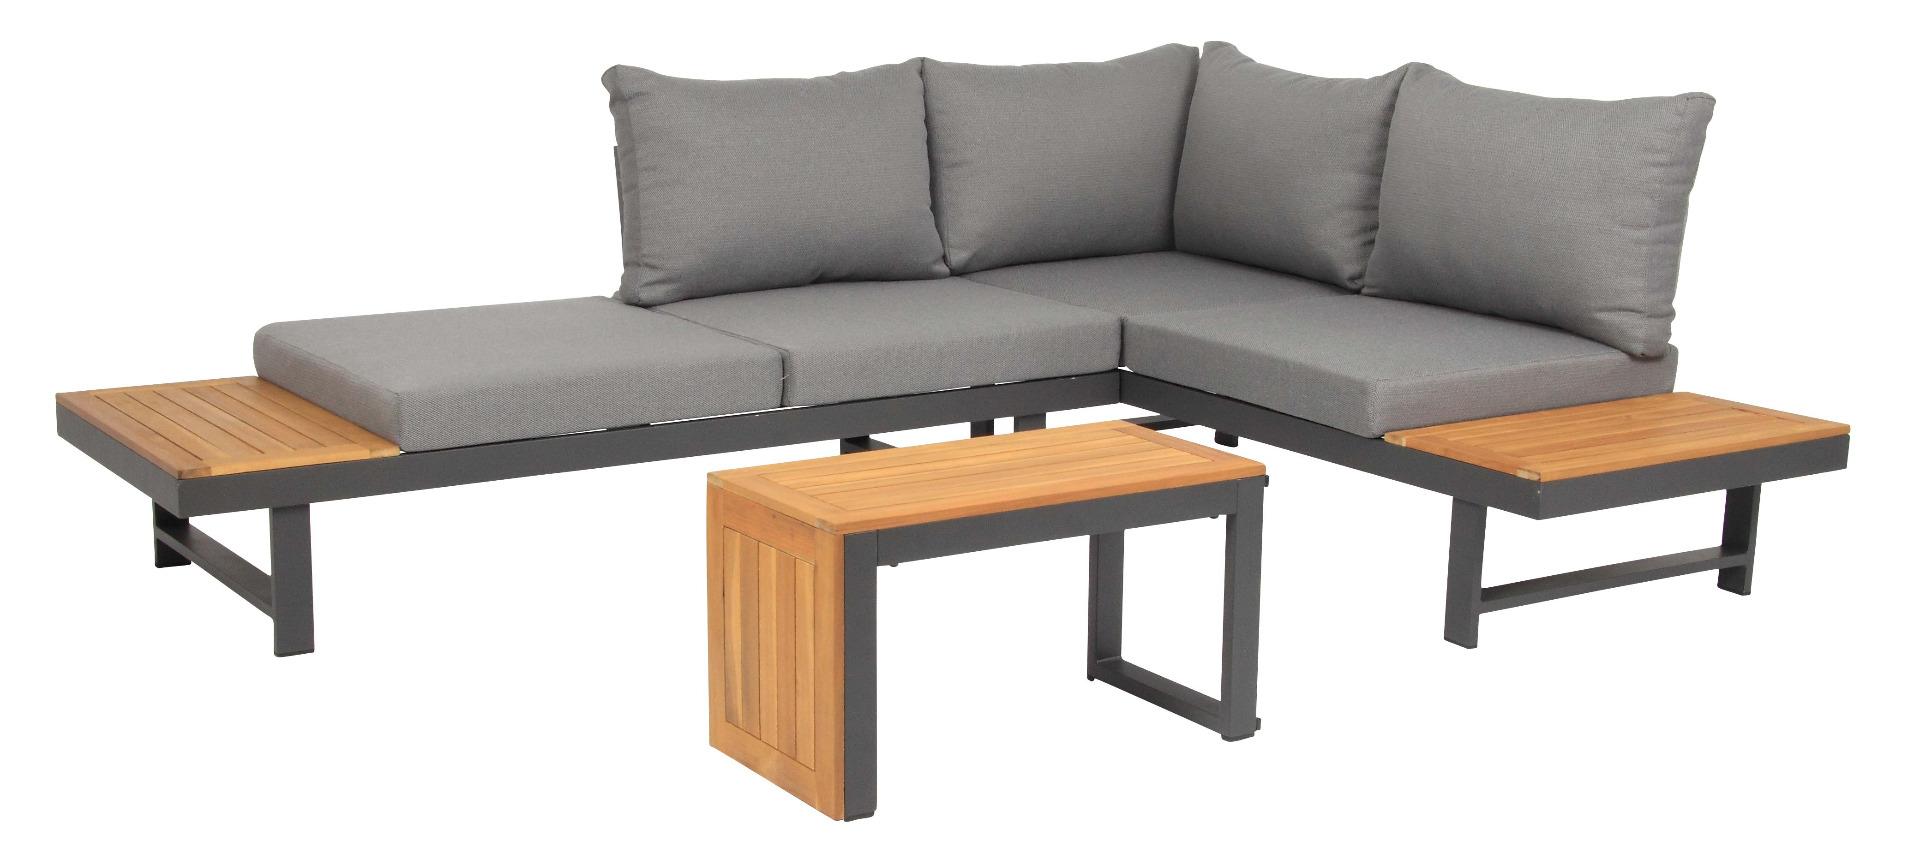 Shadow Lounge Set 3-teilig Aluminium kombiniert mit FSC Akazienholz